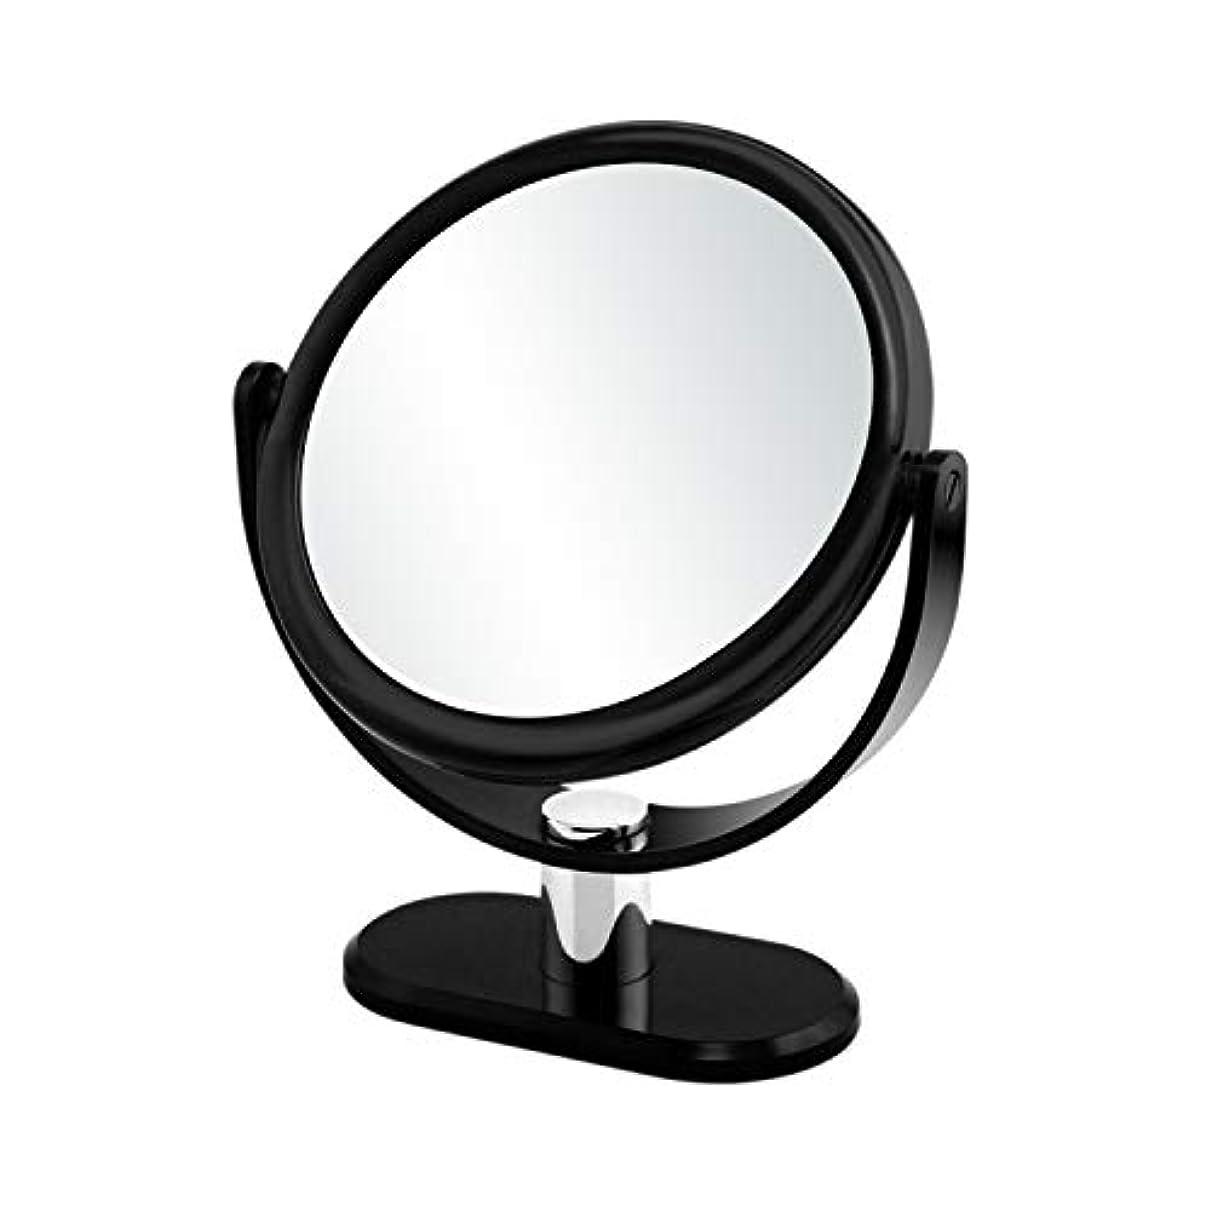 GorwRich ブラック卓上鏡 化粧鏡 スタンドミラー 女優ミラー 卓上ミラー 両面鏡 7倍拡大鏡と等倍鏡